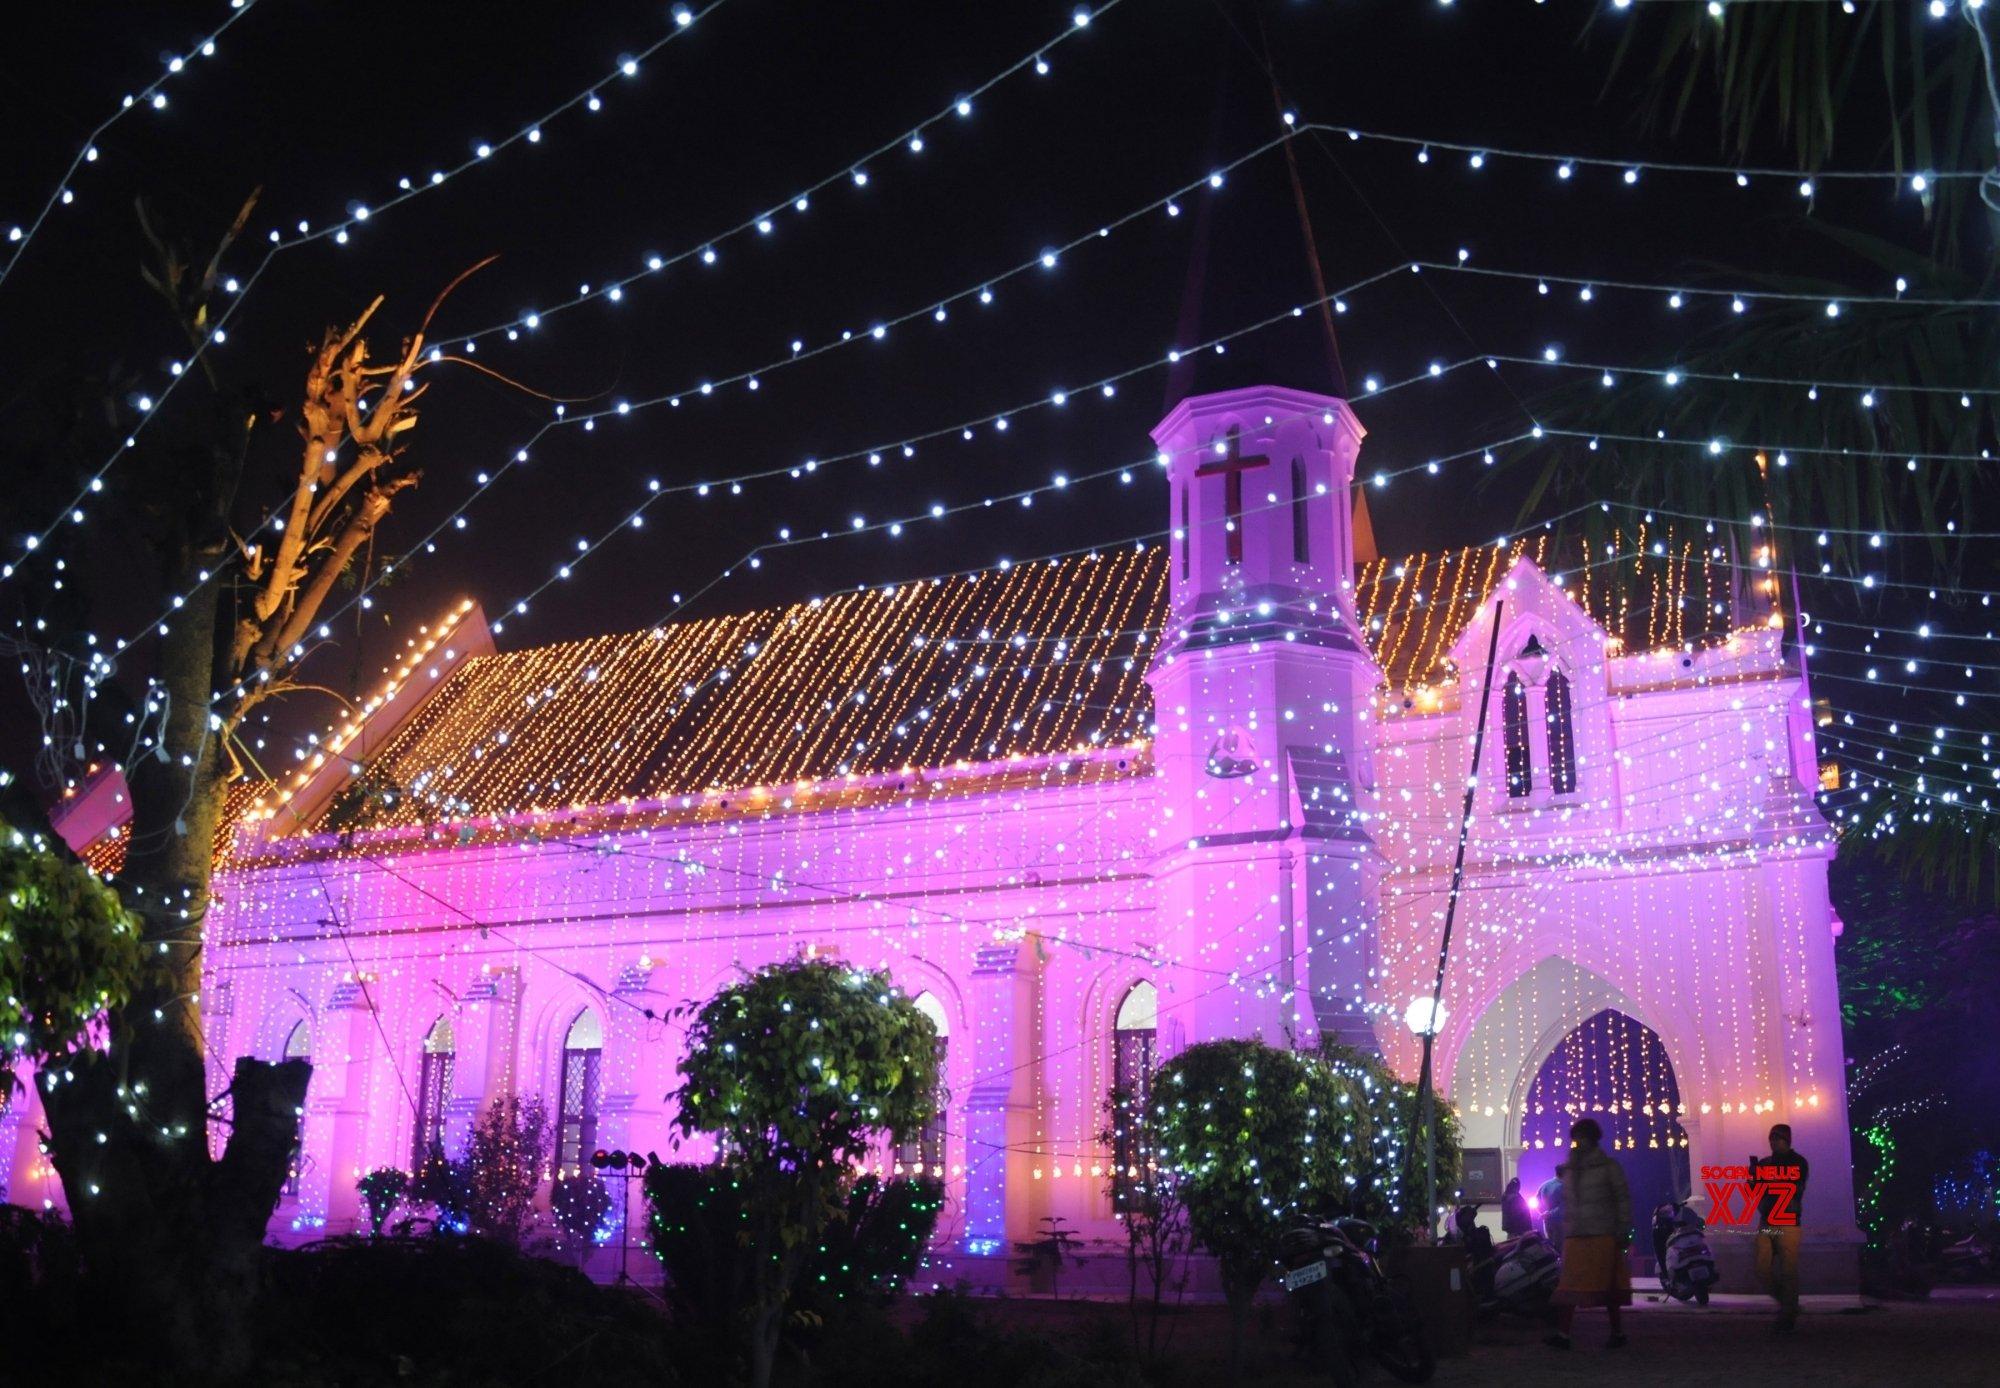 Amritsar: Christmas preparations - An illuminated St Paul's Church #Gallery